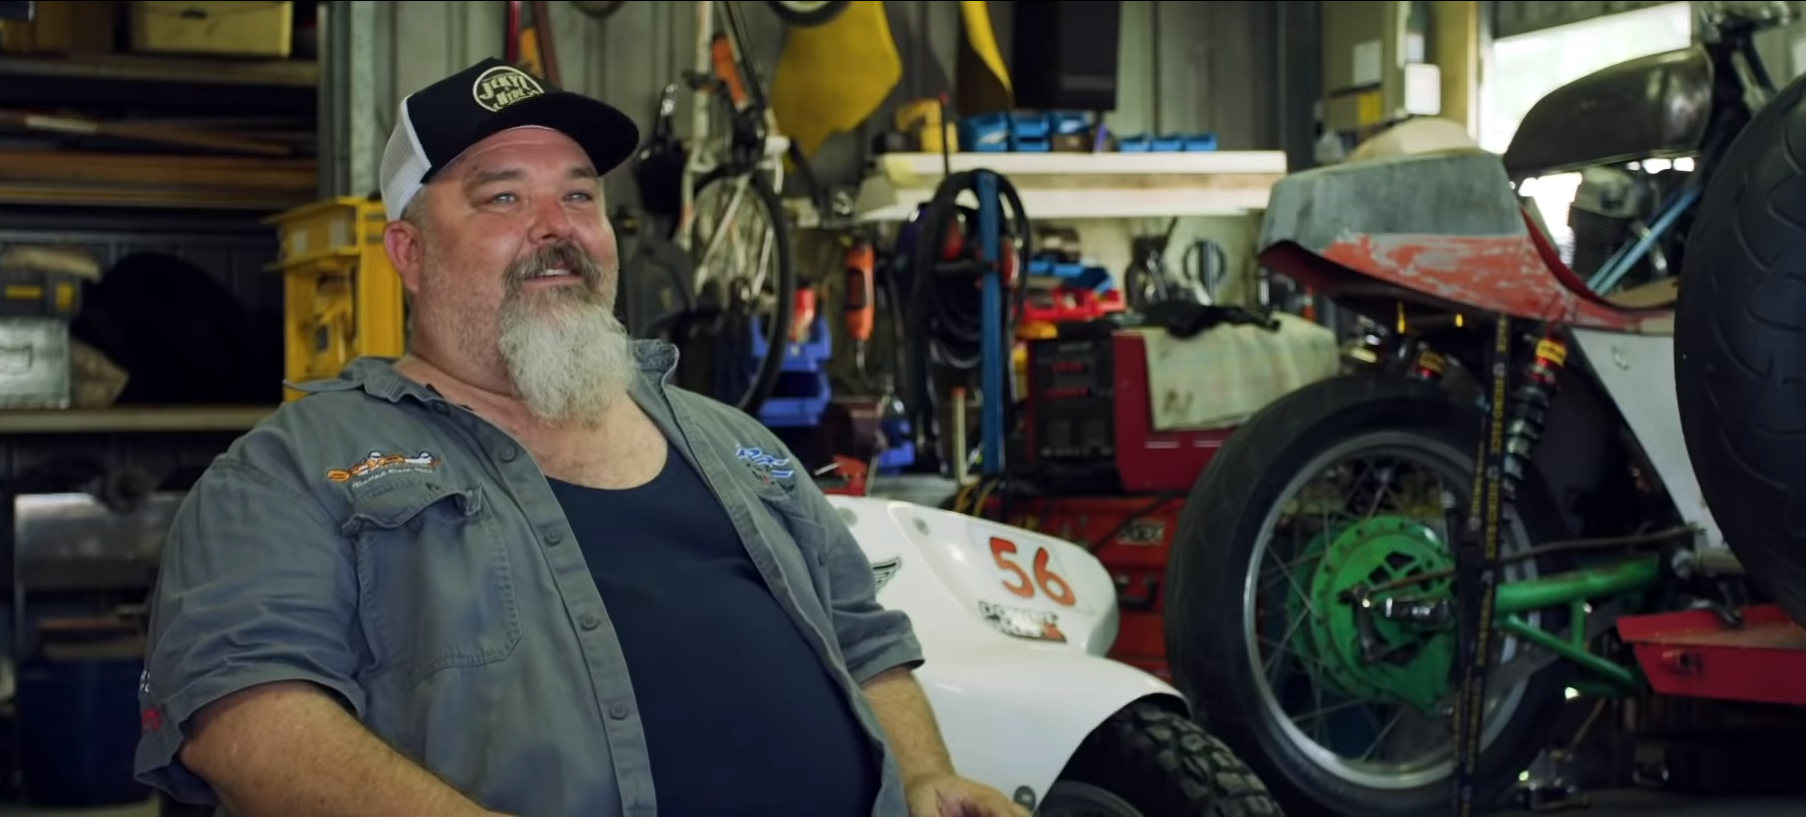 SDG moto custom motorcycle doco